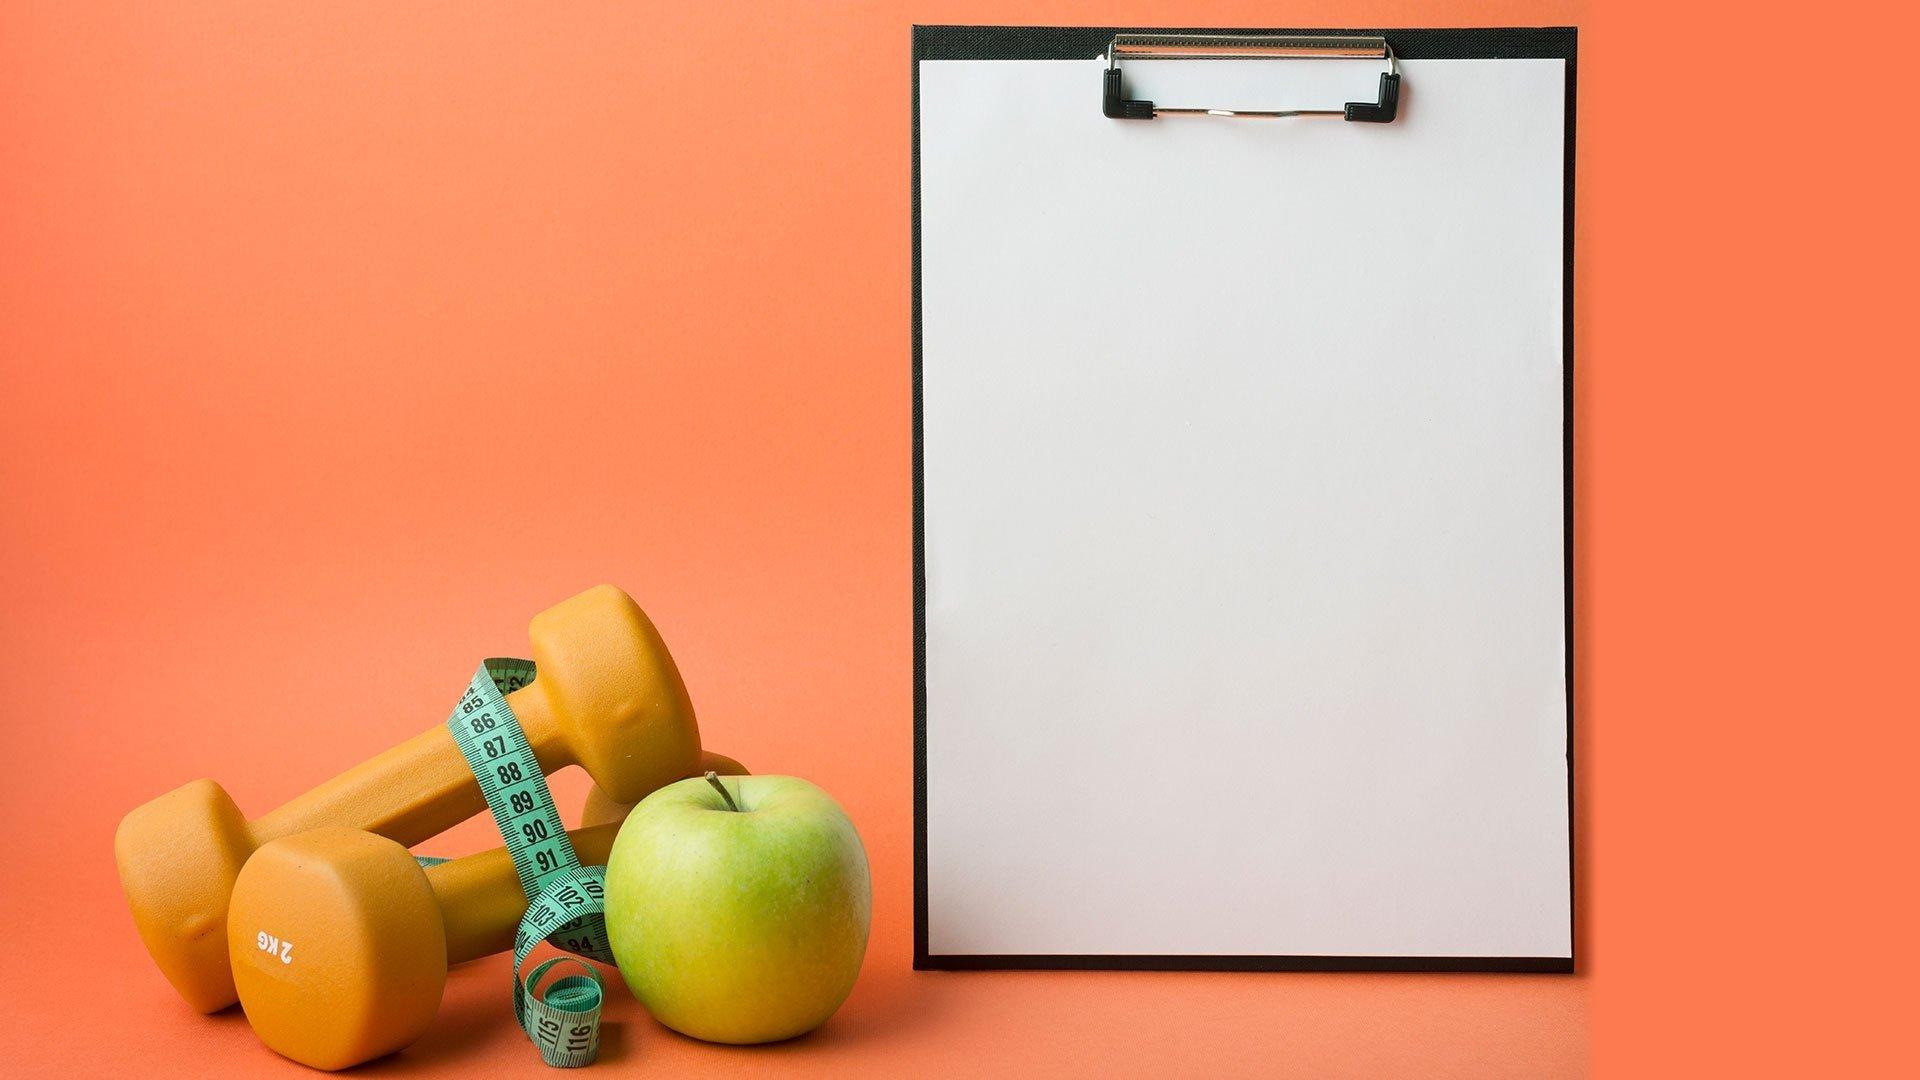 Clinica para bajar de peso